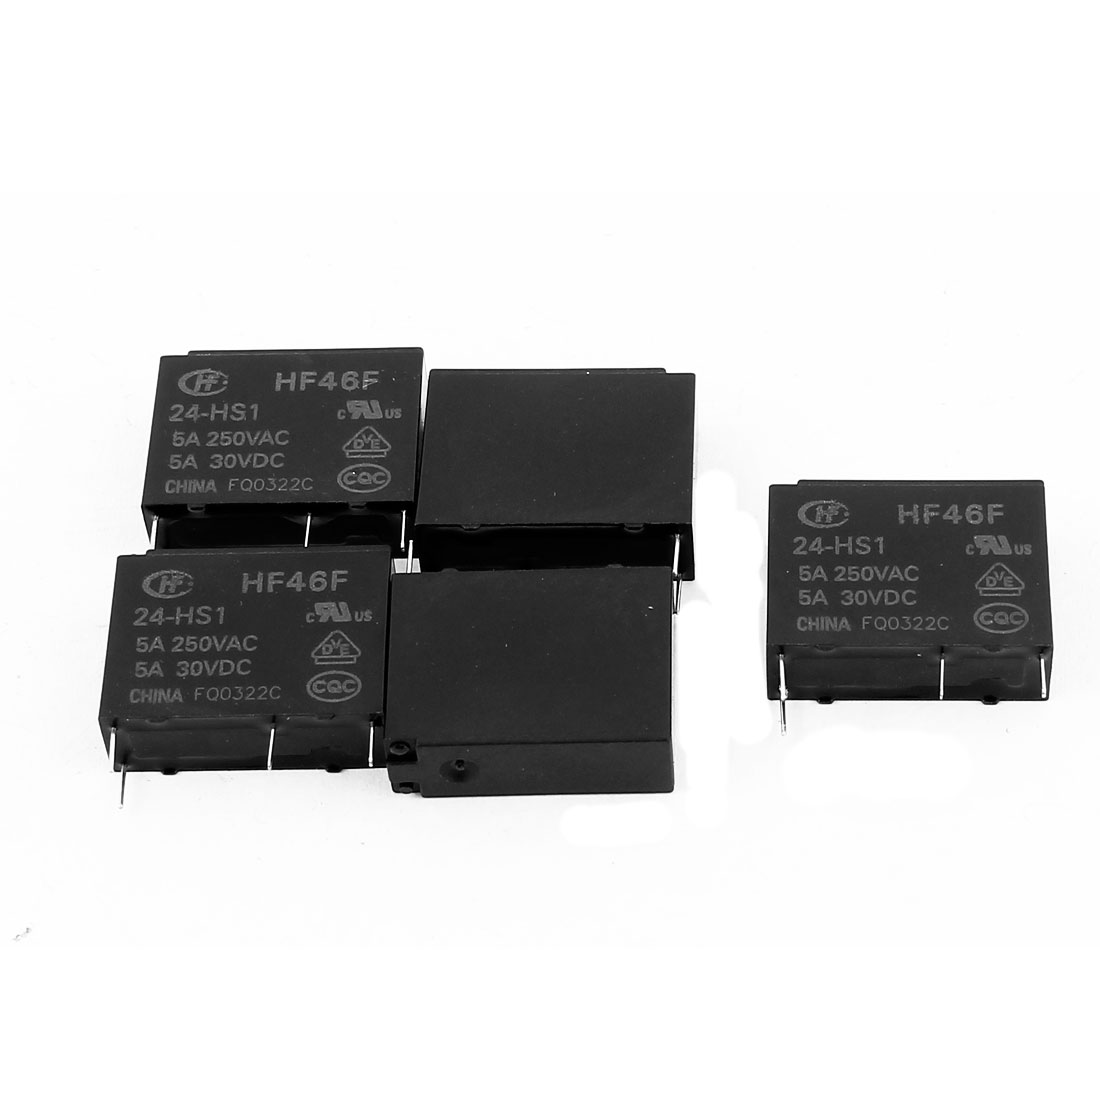 5 Pcs 24VDC 250VAC 10A 4 Terminal NO SPST HF32F-G/012-HS Power Relay